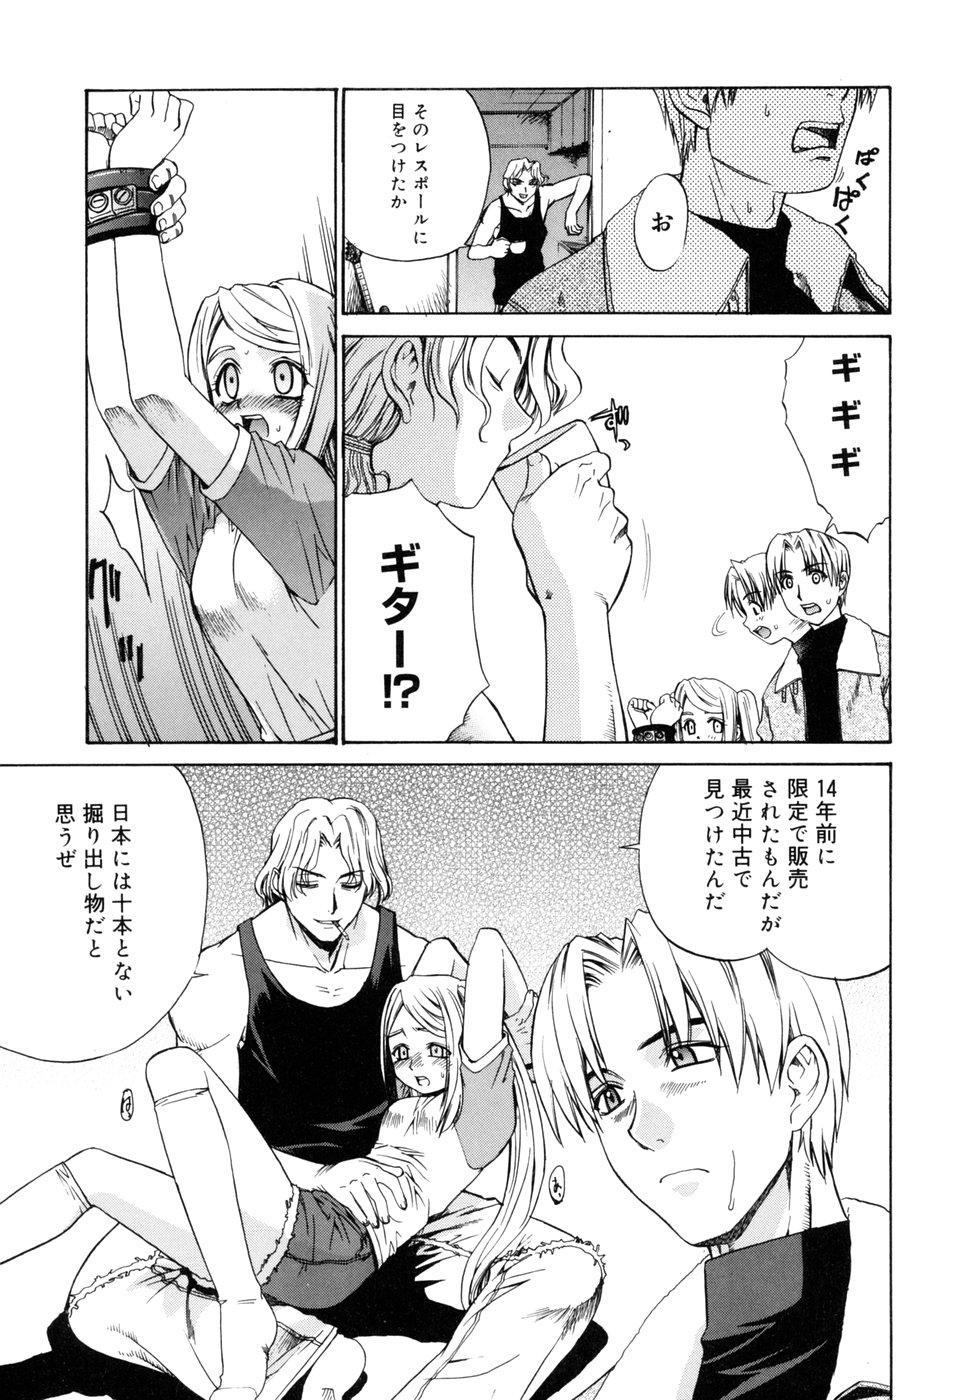 [Yaya Hinata] Tonari no Miko-san wa Minna Warau - The next shrine maidens smile in everyone. 184